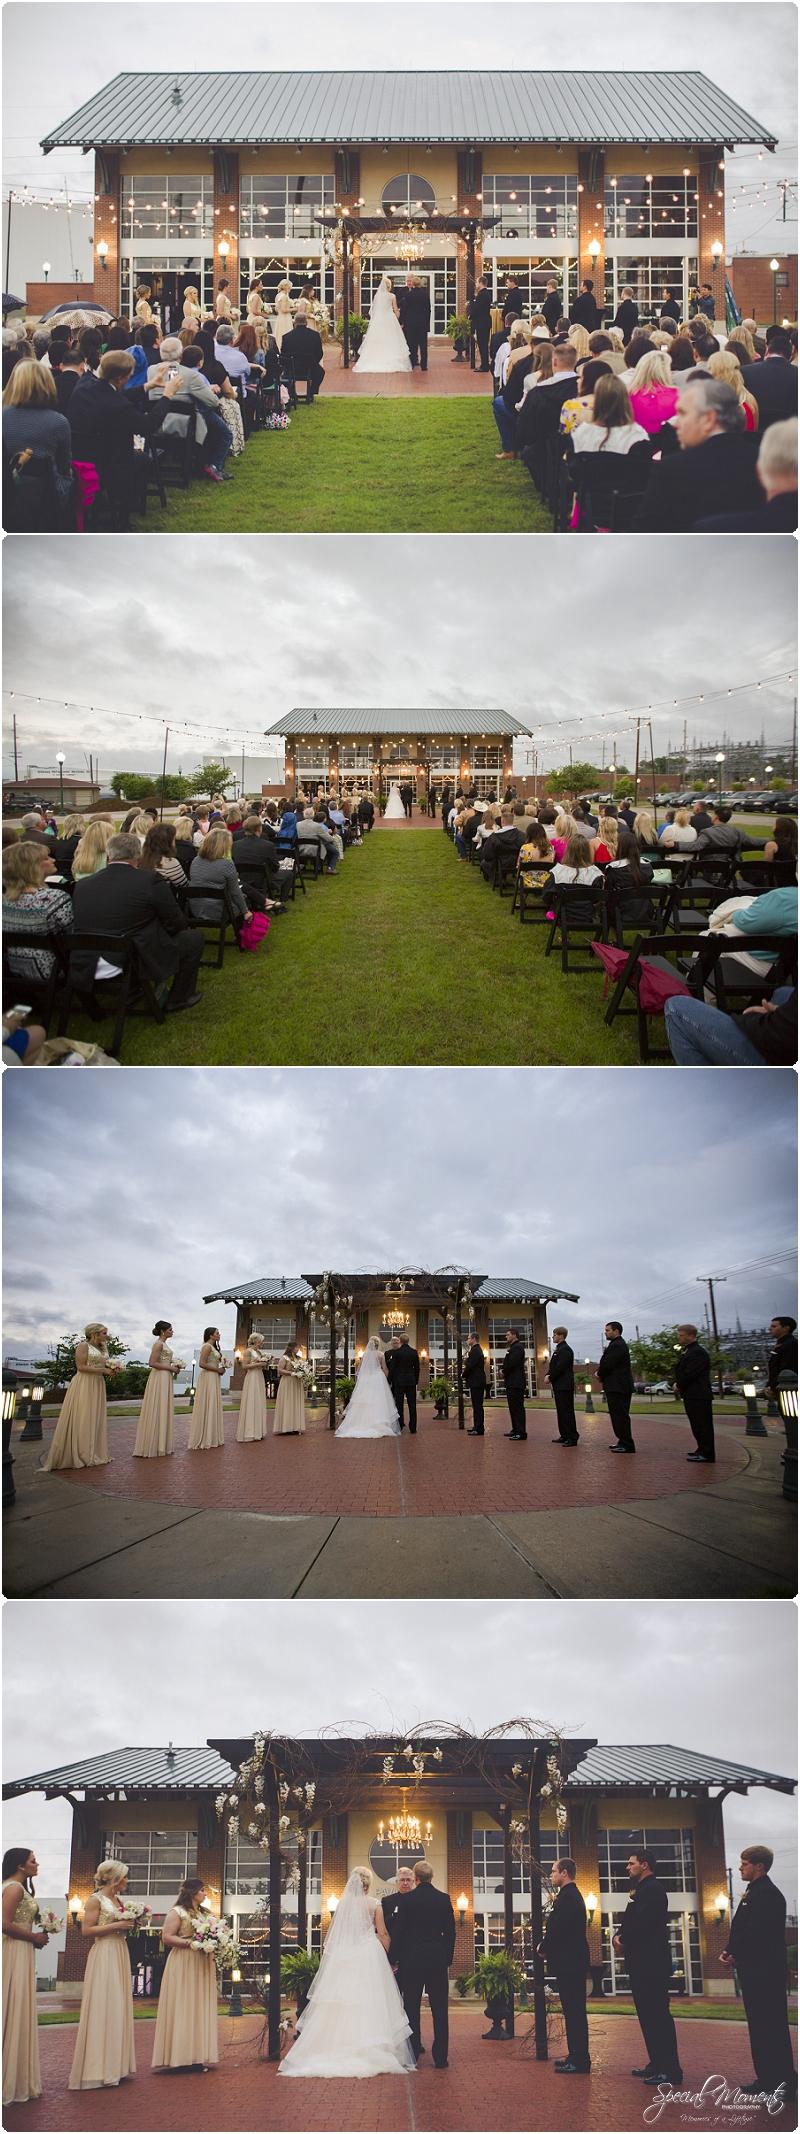 fort smith arkansas wedding photographer, fort smith arkansas wedding photography, southern weddings_0090